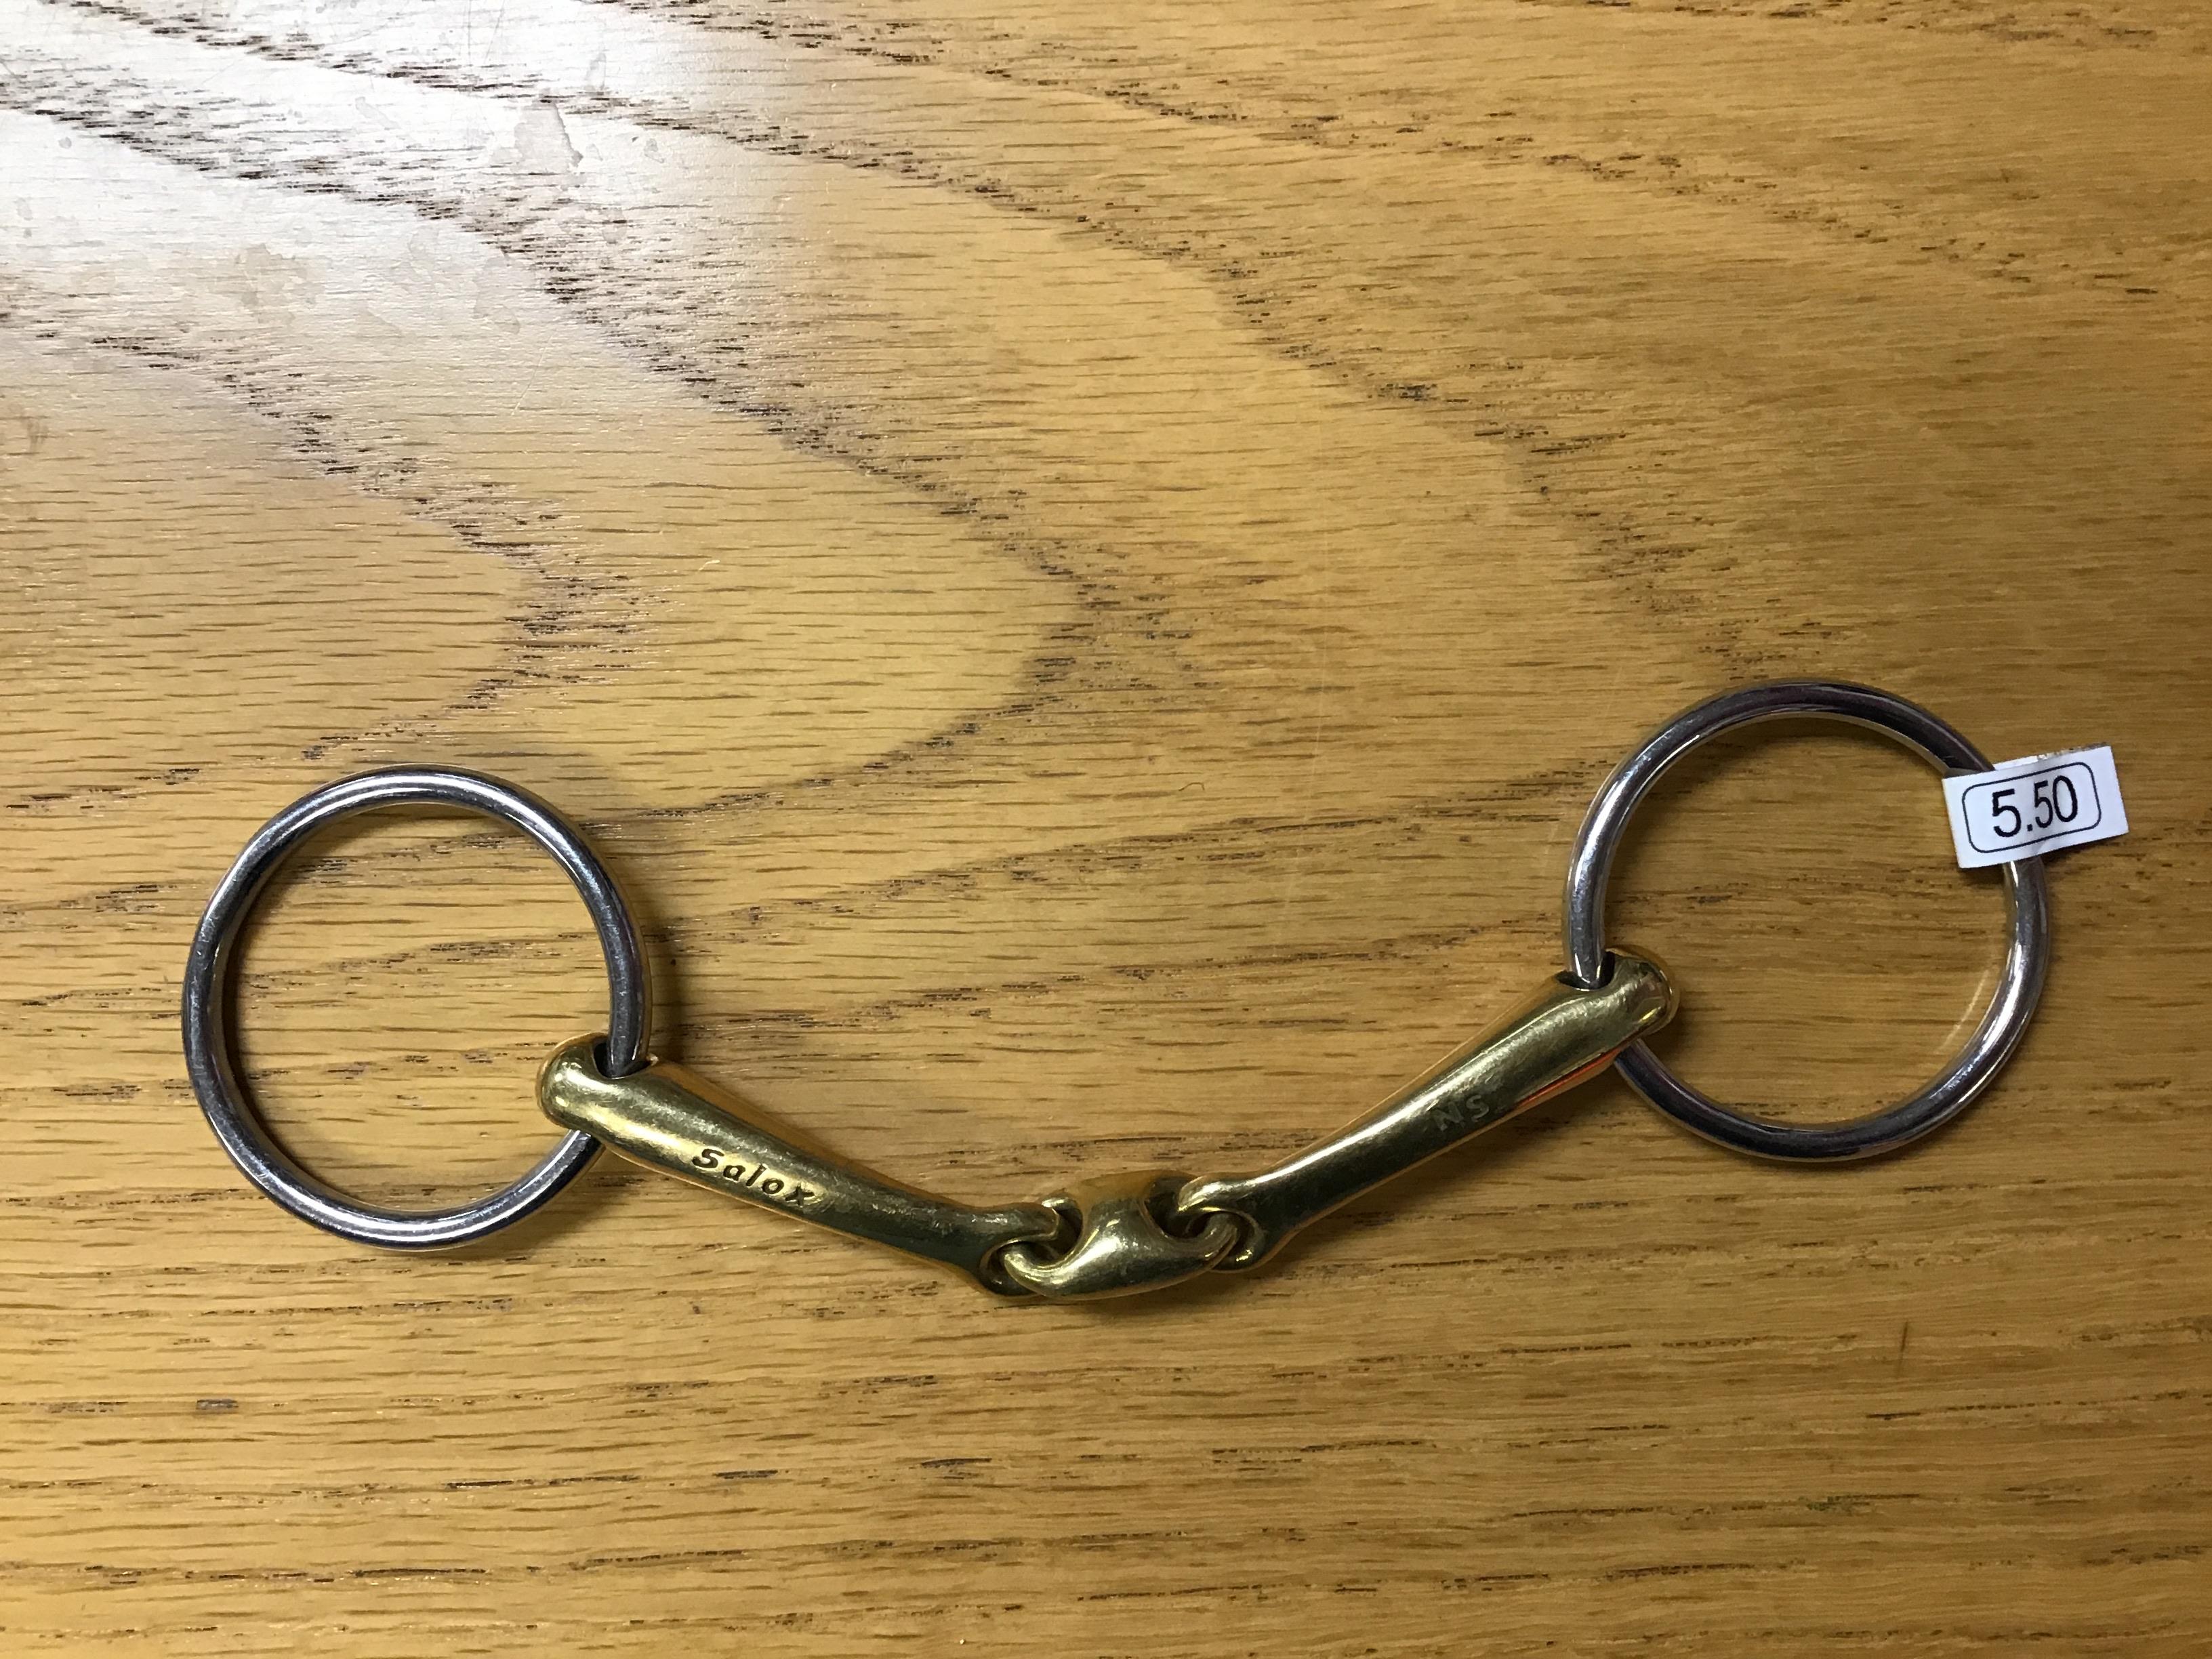 NS 55mm Ring Tranz Angled Lozenge 14mm mouthpiece